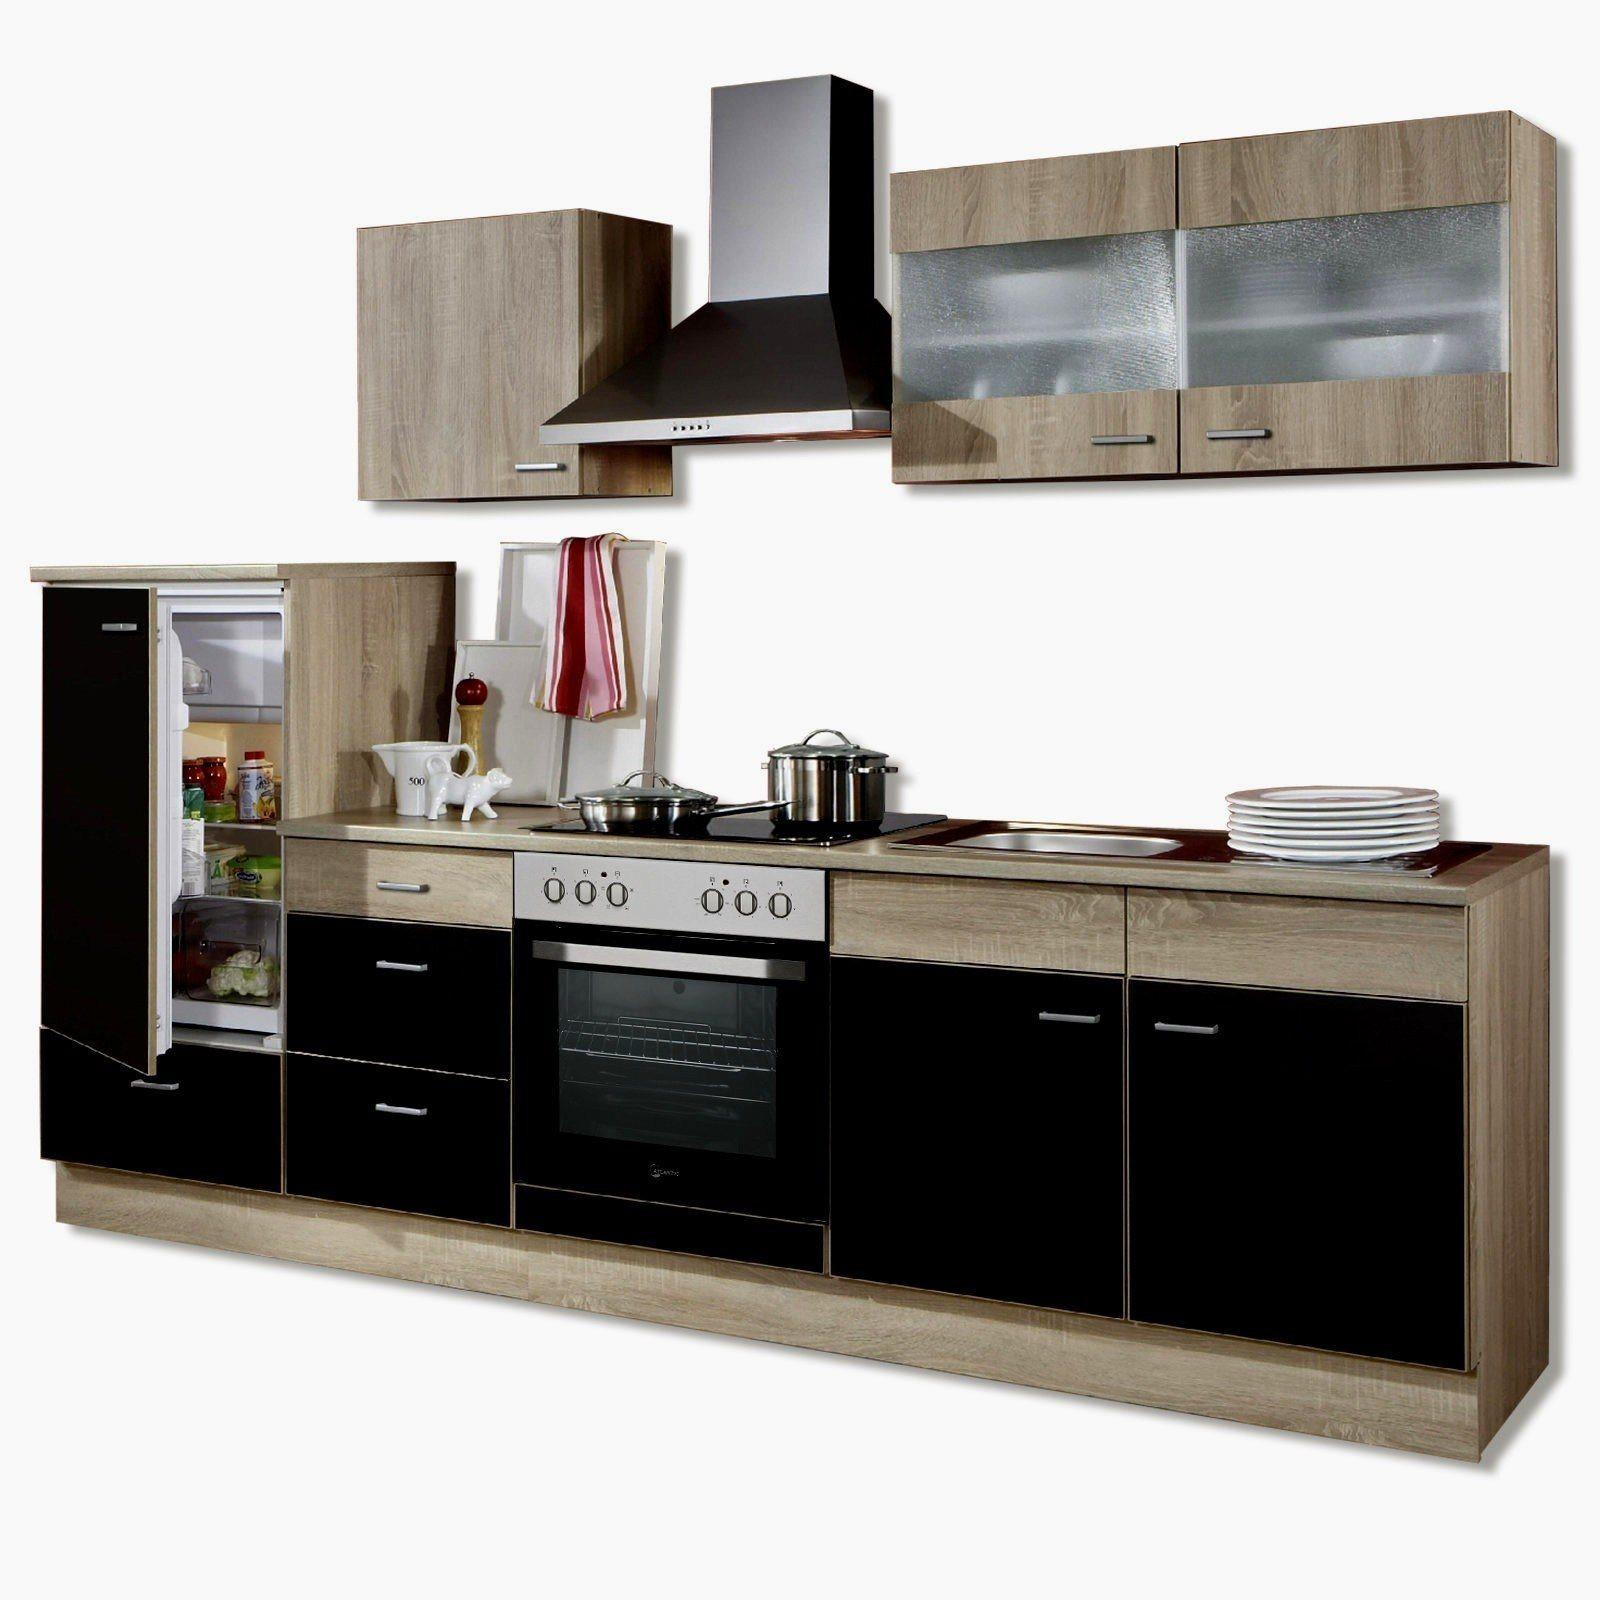 Küche Kaufen Roller  Küche Kaufen Roller Küche planen Küche planen